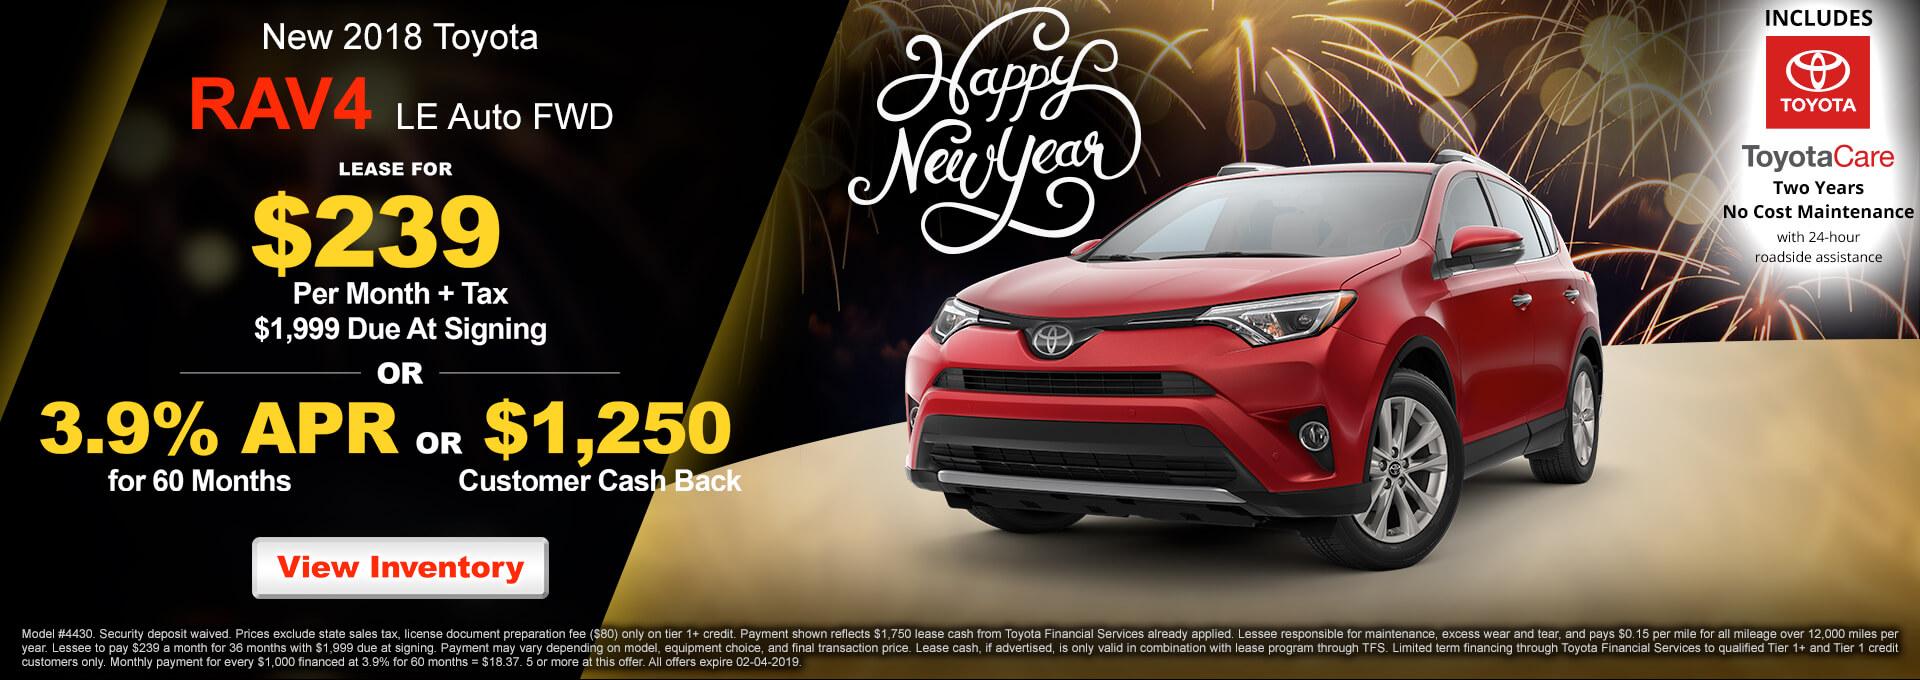 2018 Toyota RAV4 LE $239